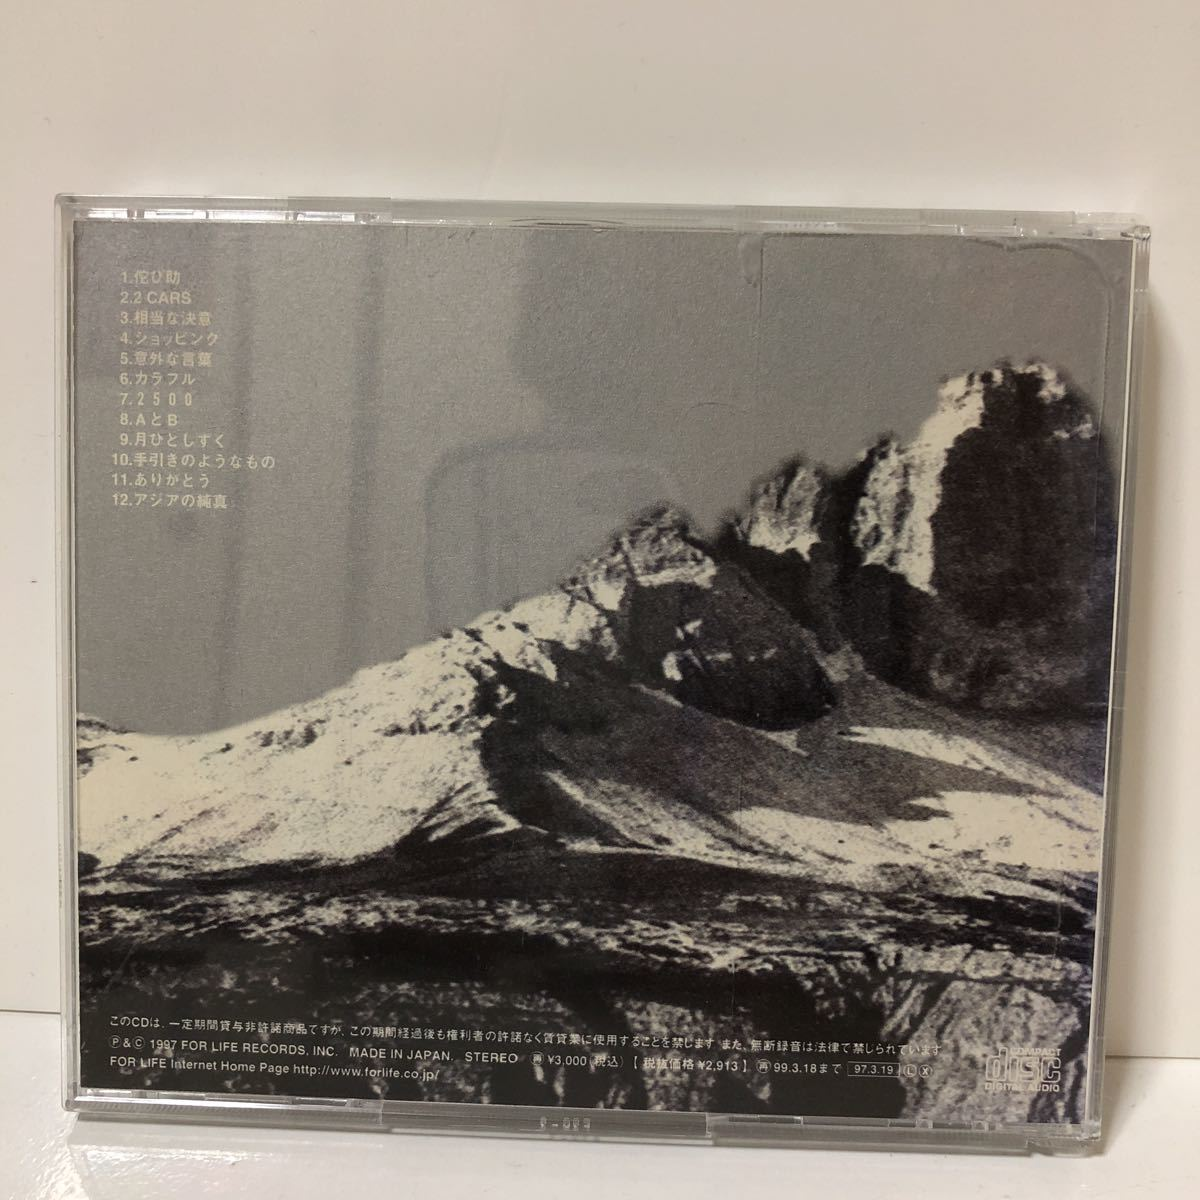 CD 蔵出し-396【Jポップ】(レンタルおち) ショッピング / 井上陽水.奥田民生_画像2